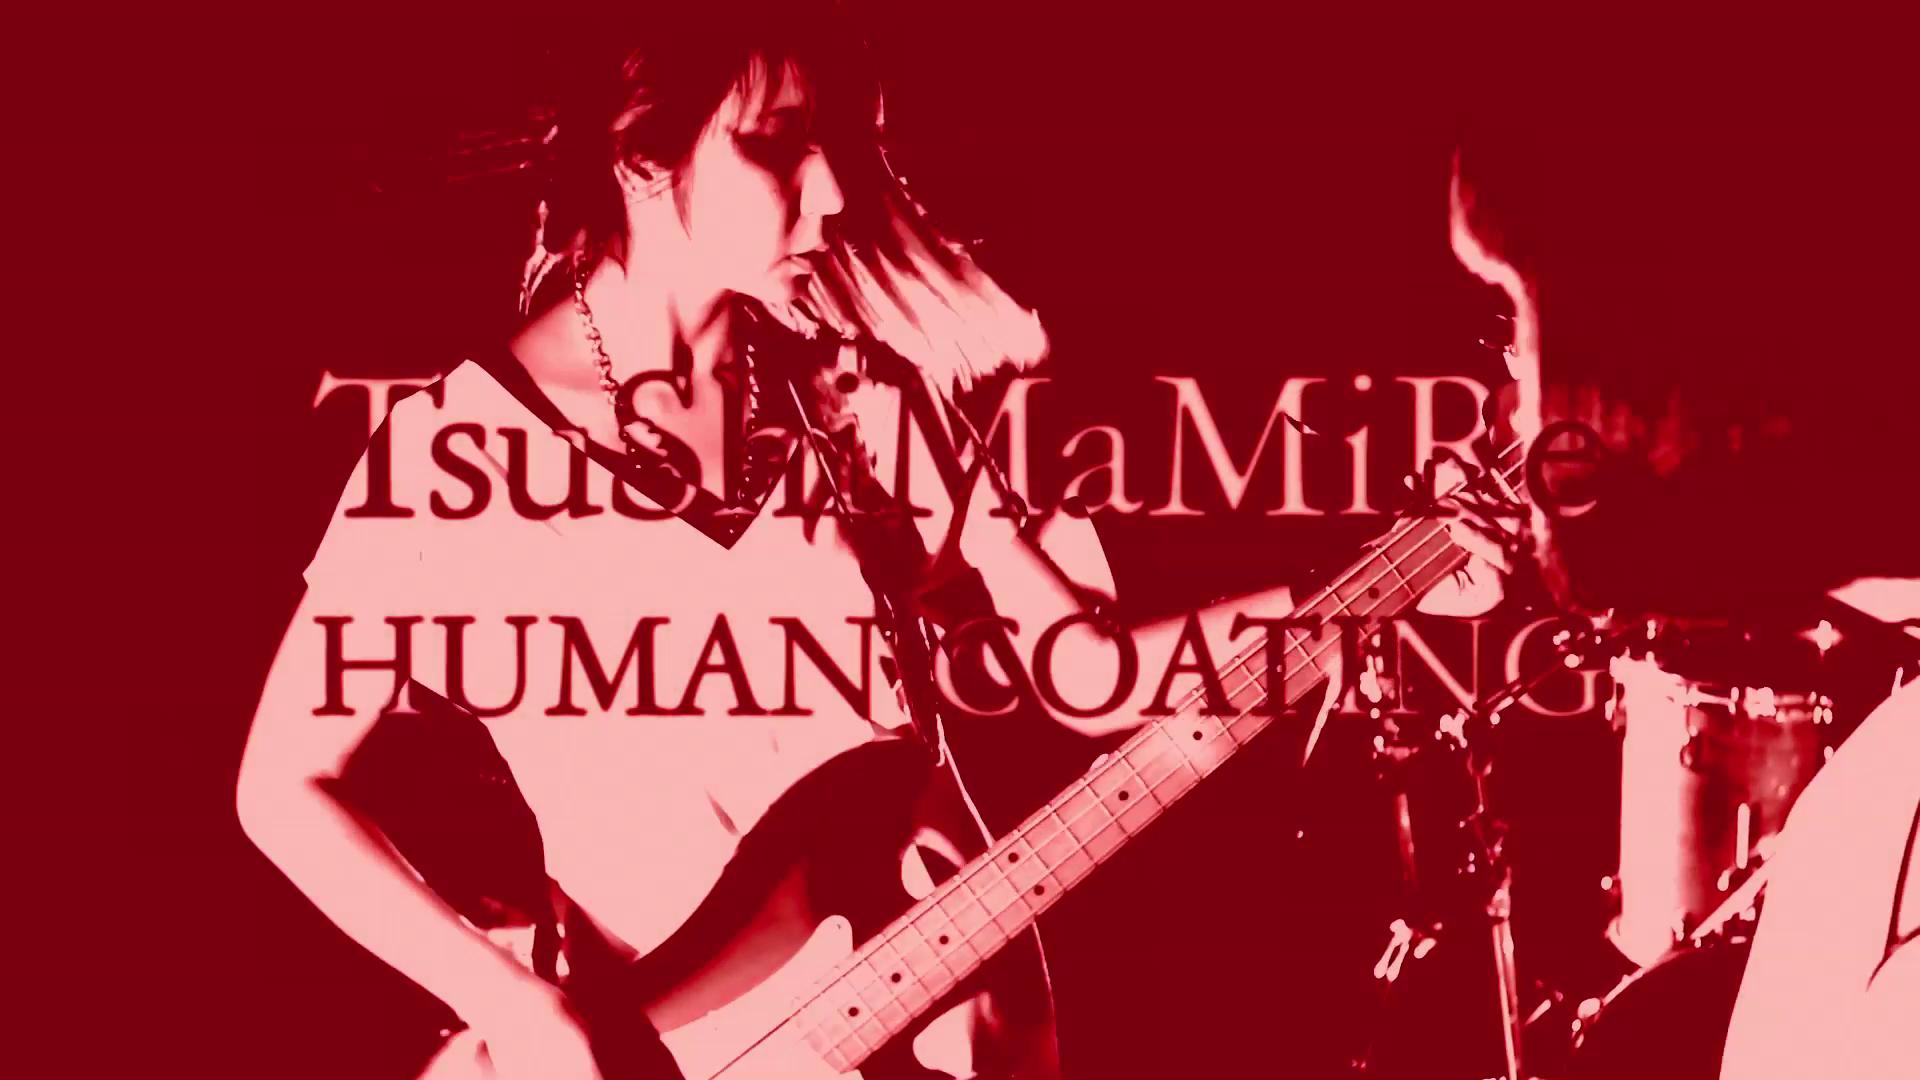 JRock247-TsuShiMaMiRe-Human-Coating-MV-1B